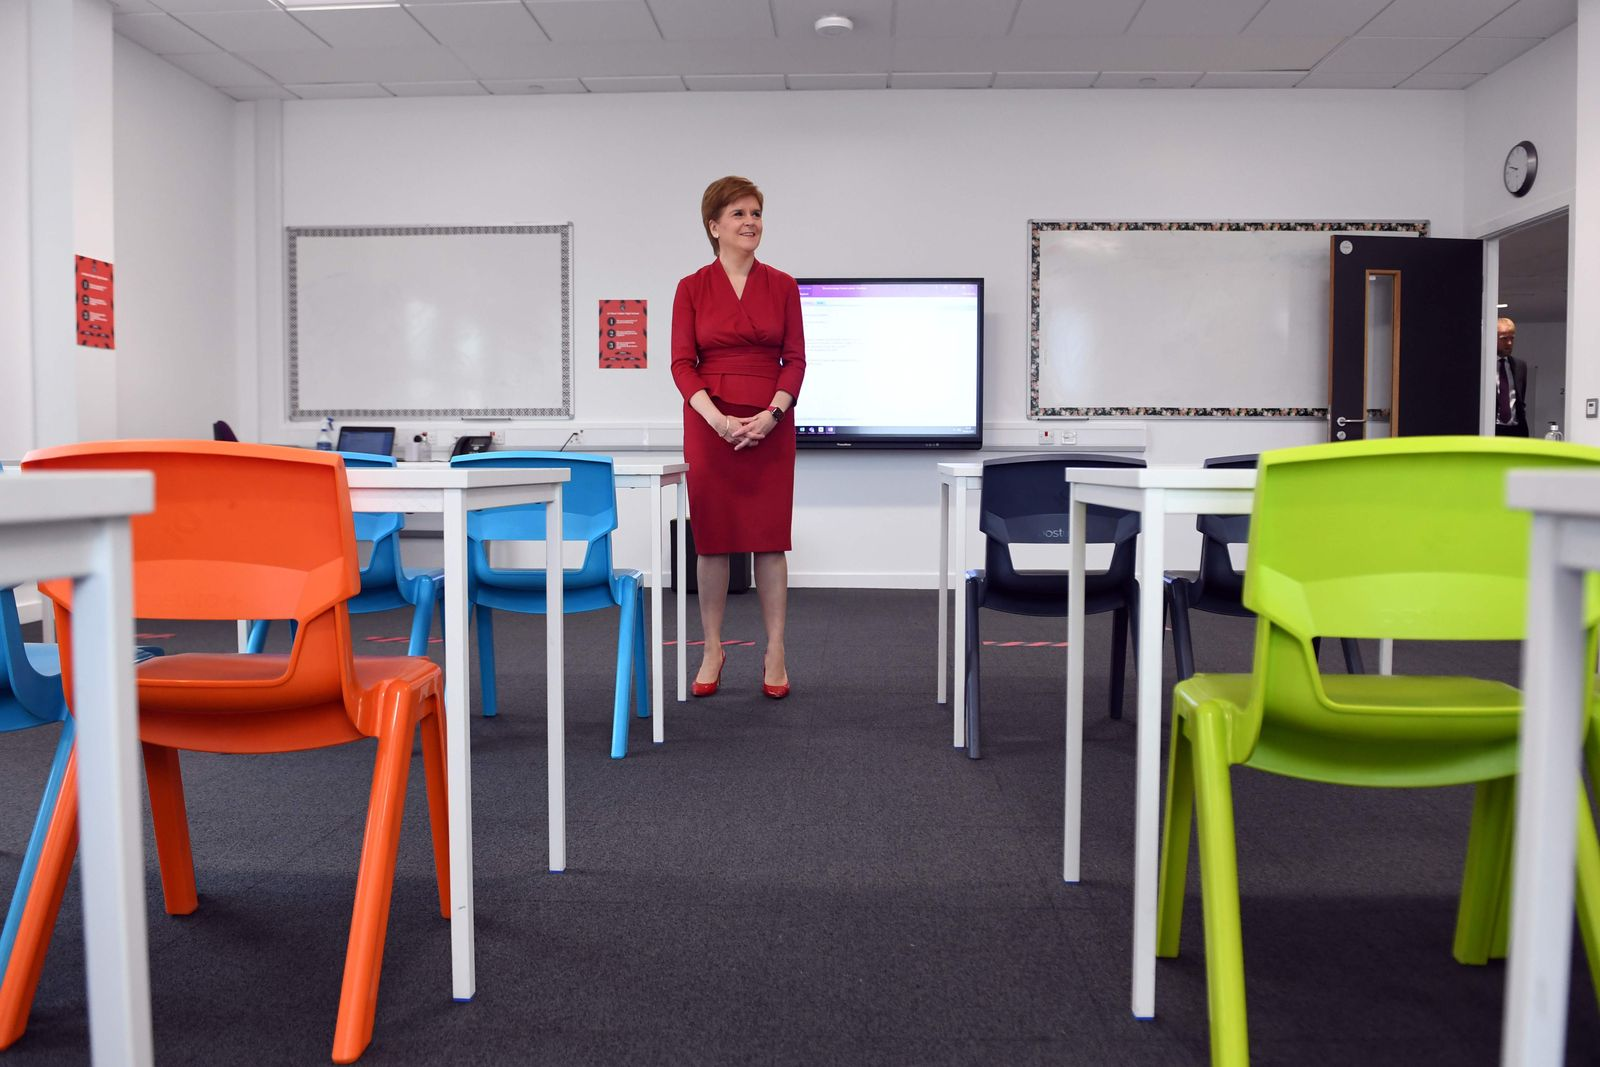 BRITAIN-SCOTLAND-HEALTH-VIRUS-EDUCATION-SCHOOL